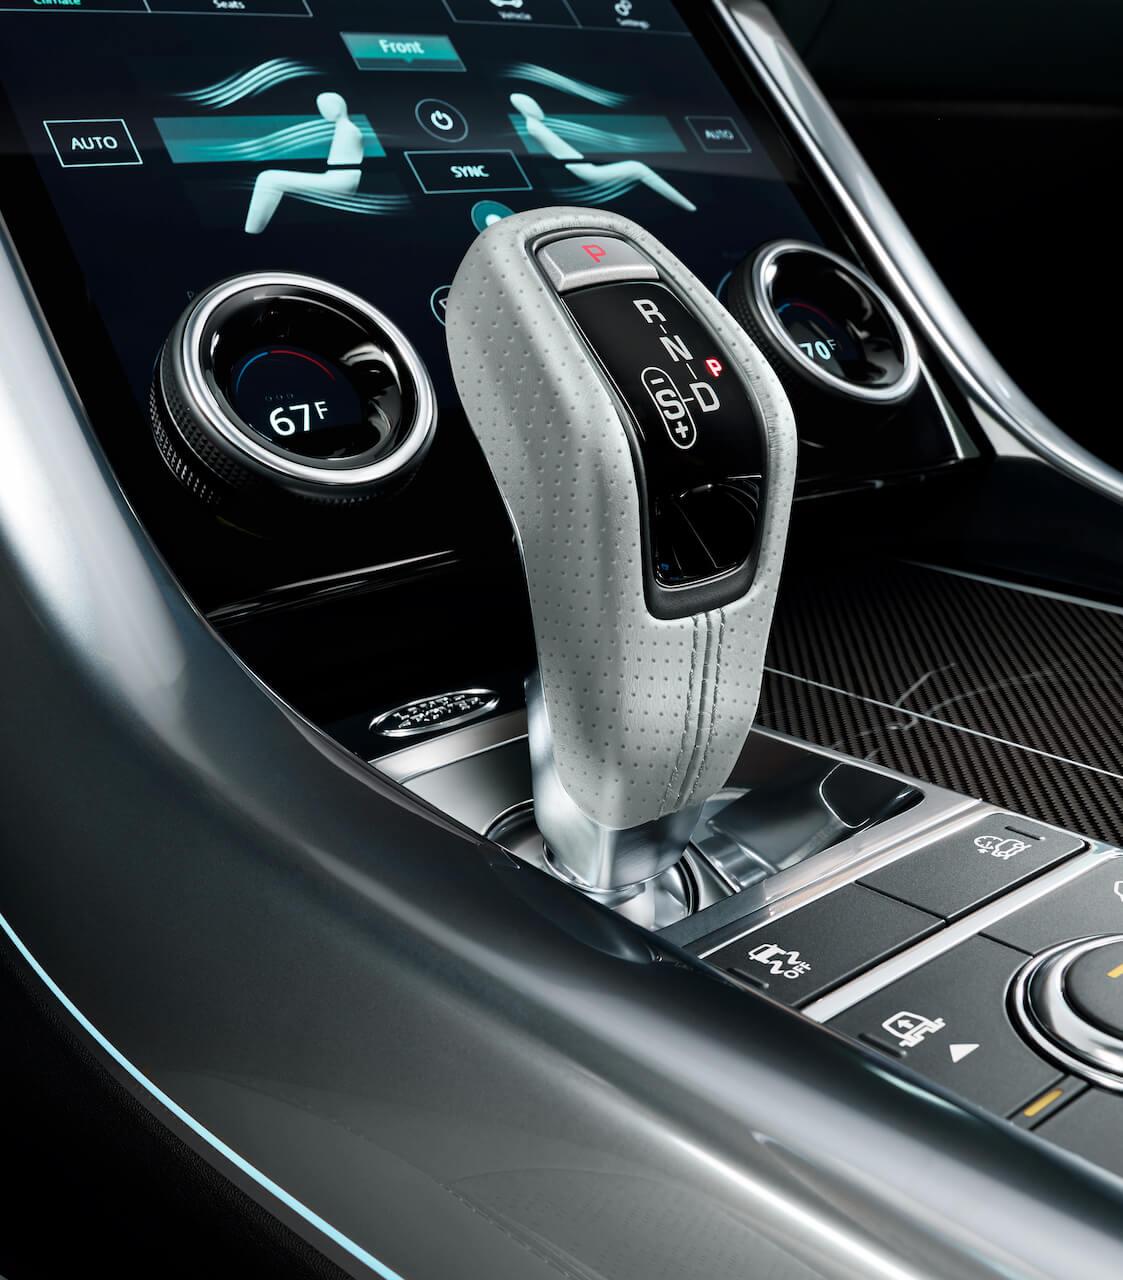 Range Rover Sport transmission